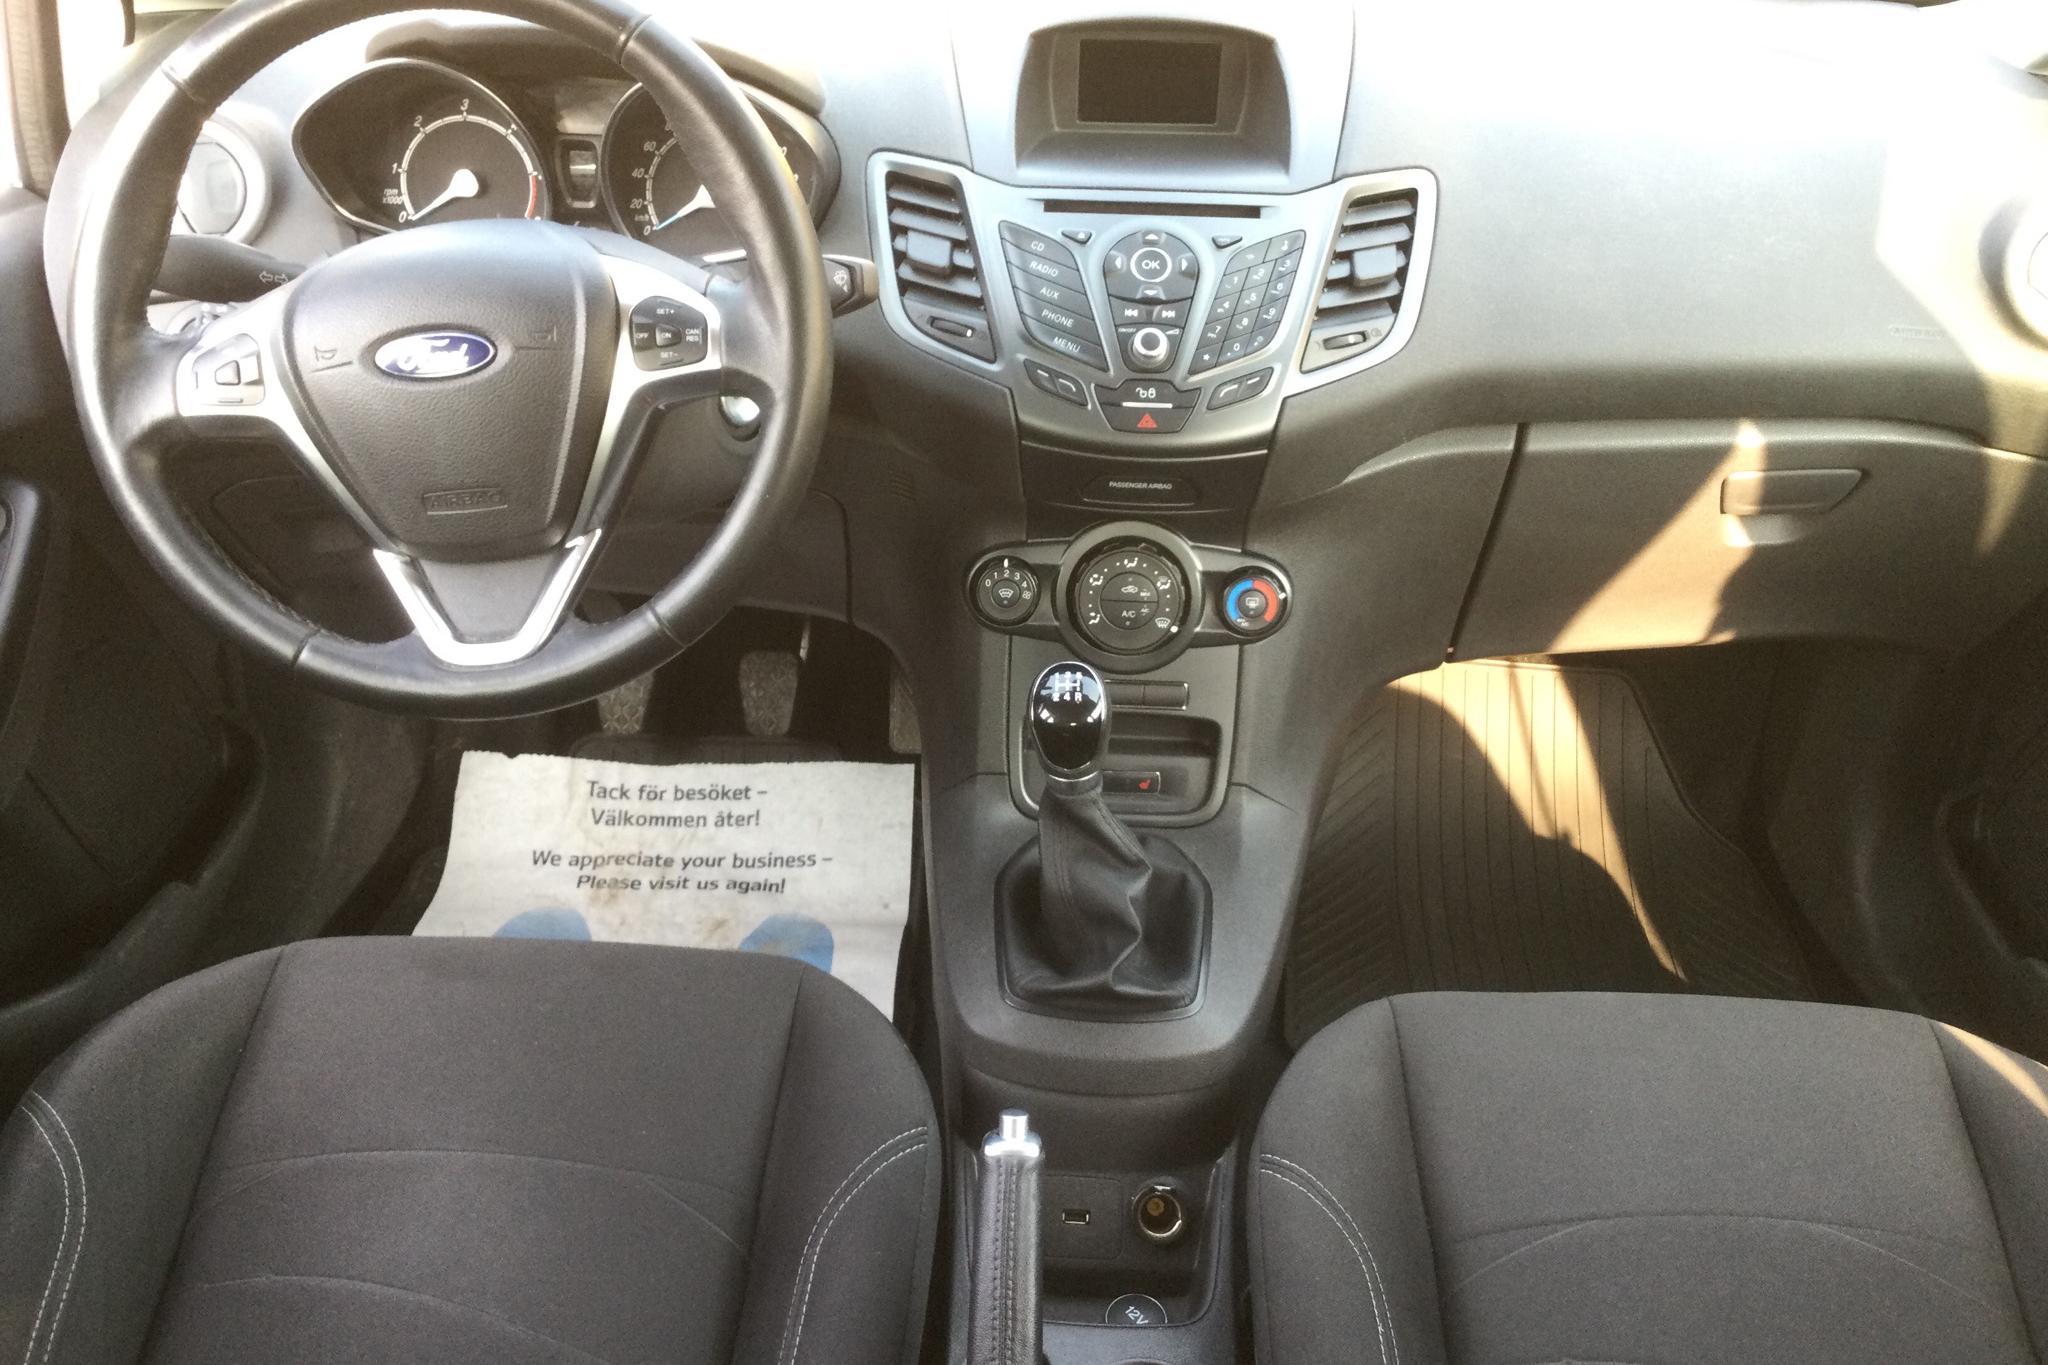 Ford Fiesta 1.5 TDCi Econetic 5dr (95hk) - 149 880 km - Manual - white - 2017